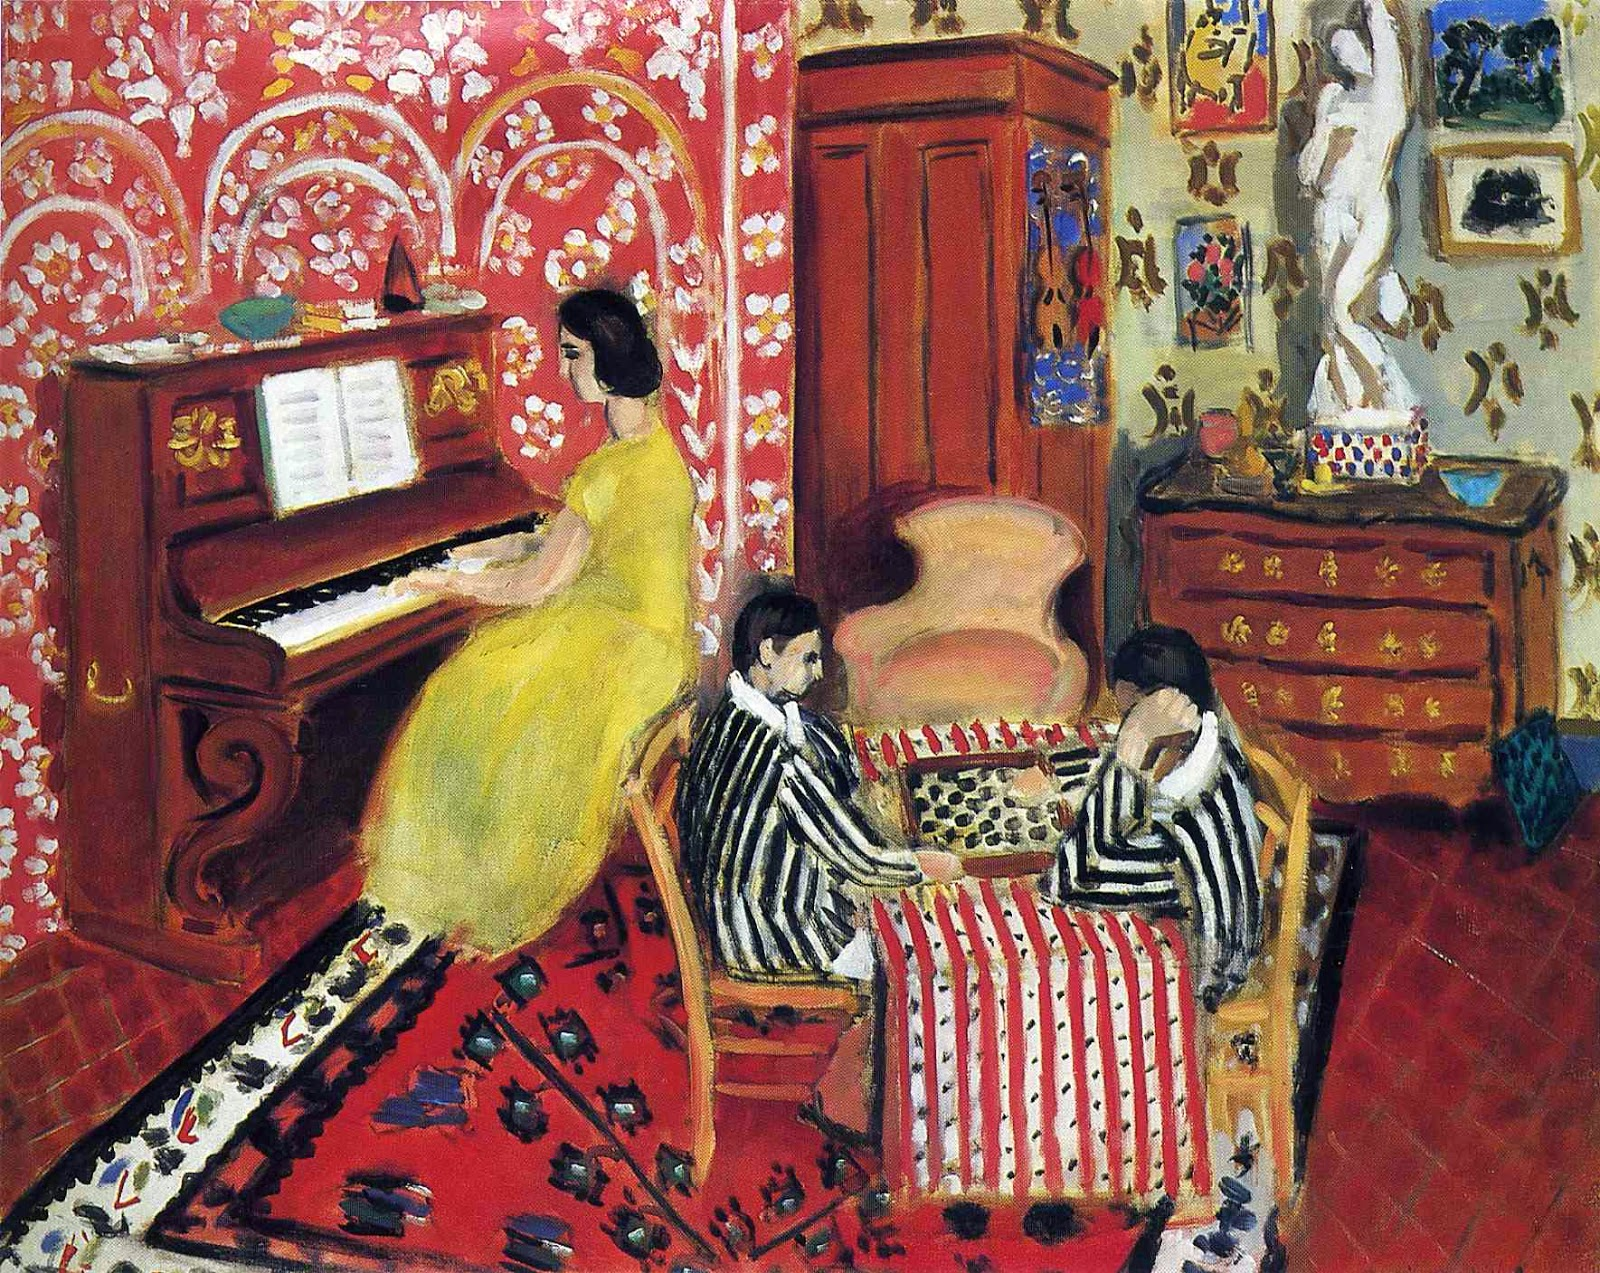 Le Curieux Monsieur Cocosse Journal Checker Players